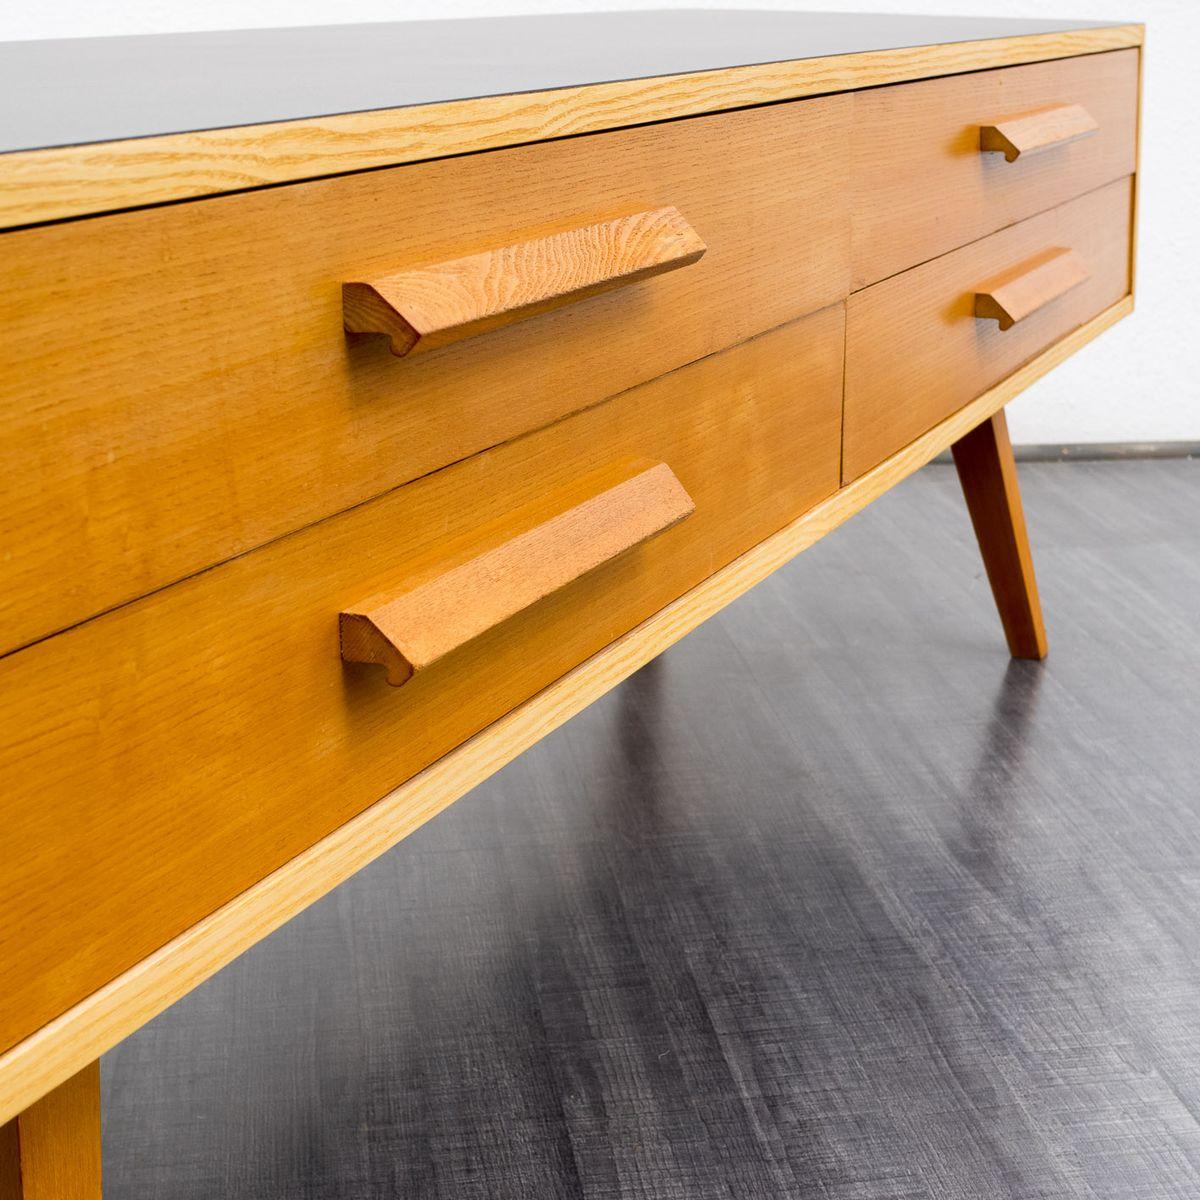 ulme und resopal sideboard 1950er bei pamono kaufen. Black Bedroom Furniture Sets. Home Design Ideas